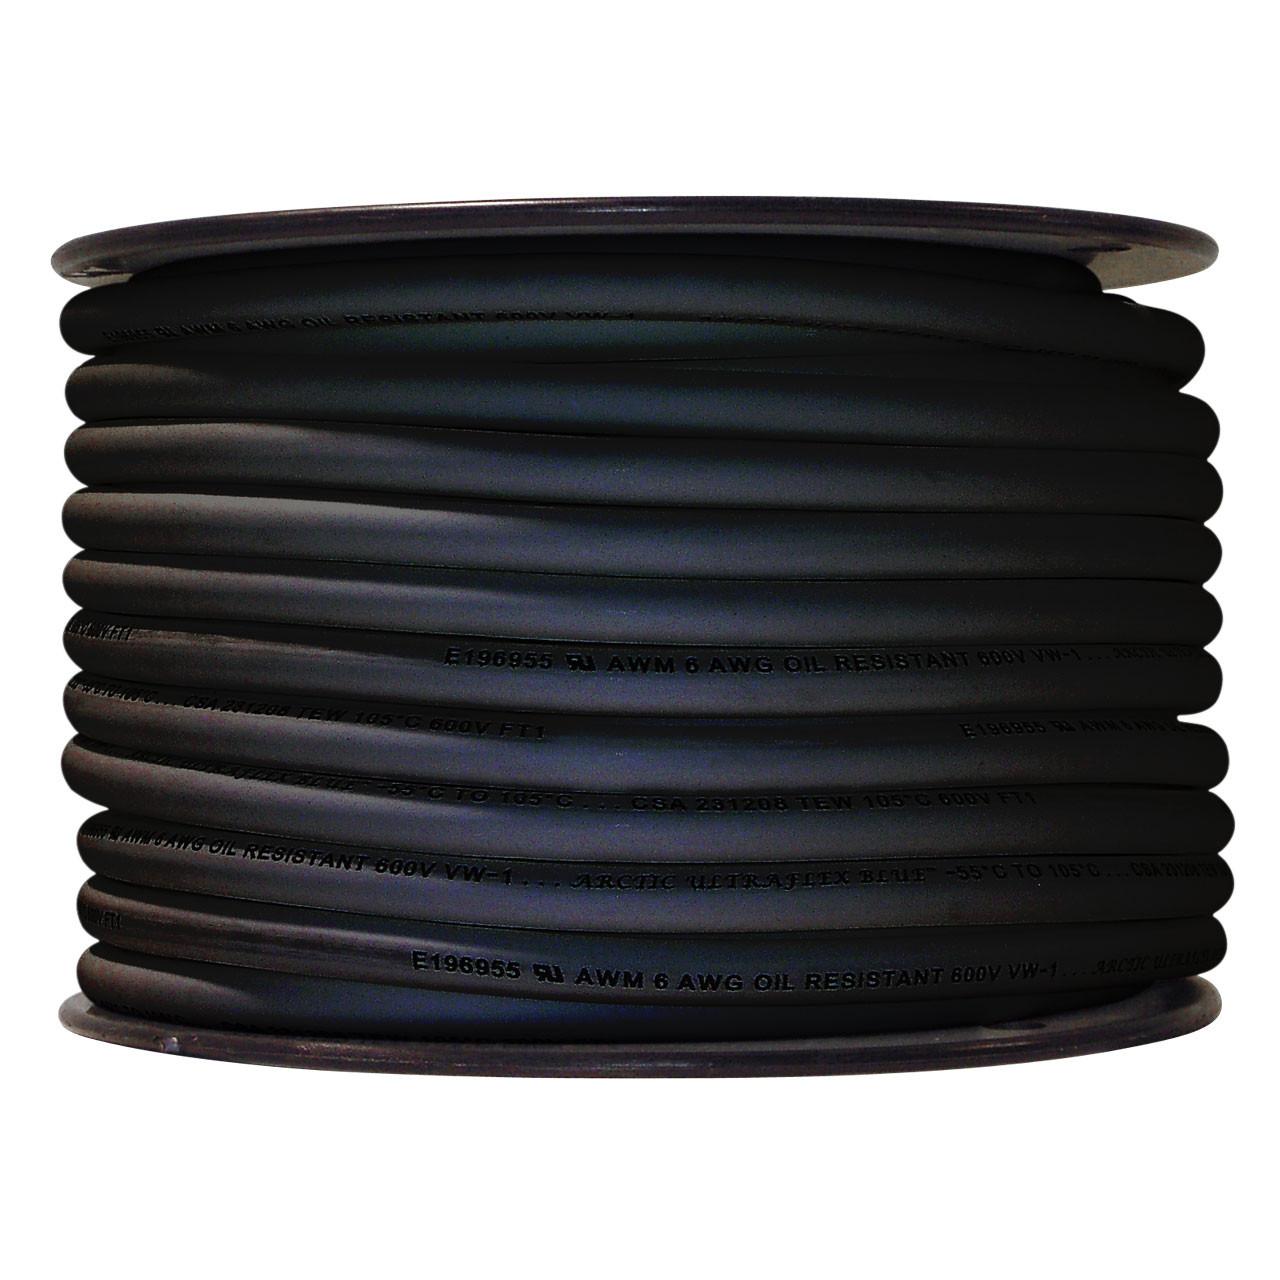 ARCTIC ULTRAFLEX 6GA BLACK 100 FOOT ROLL